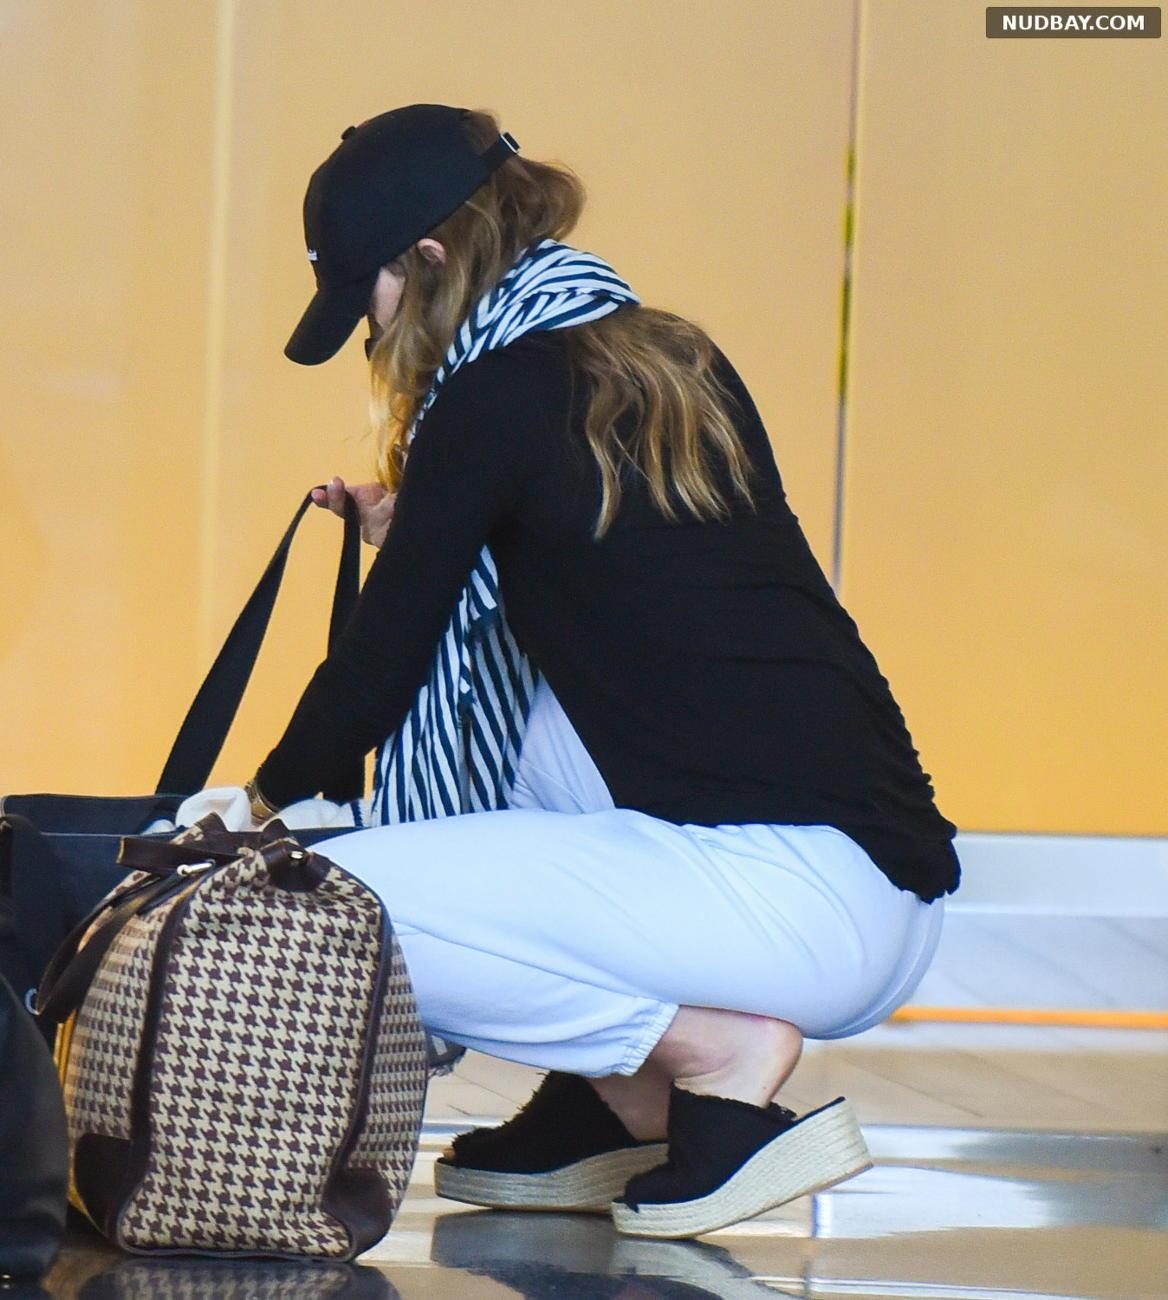 Olivia Wilde Is spotted departing JFK Airport in New York Jun 28 2021